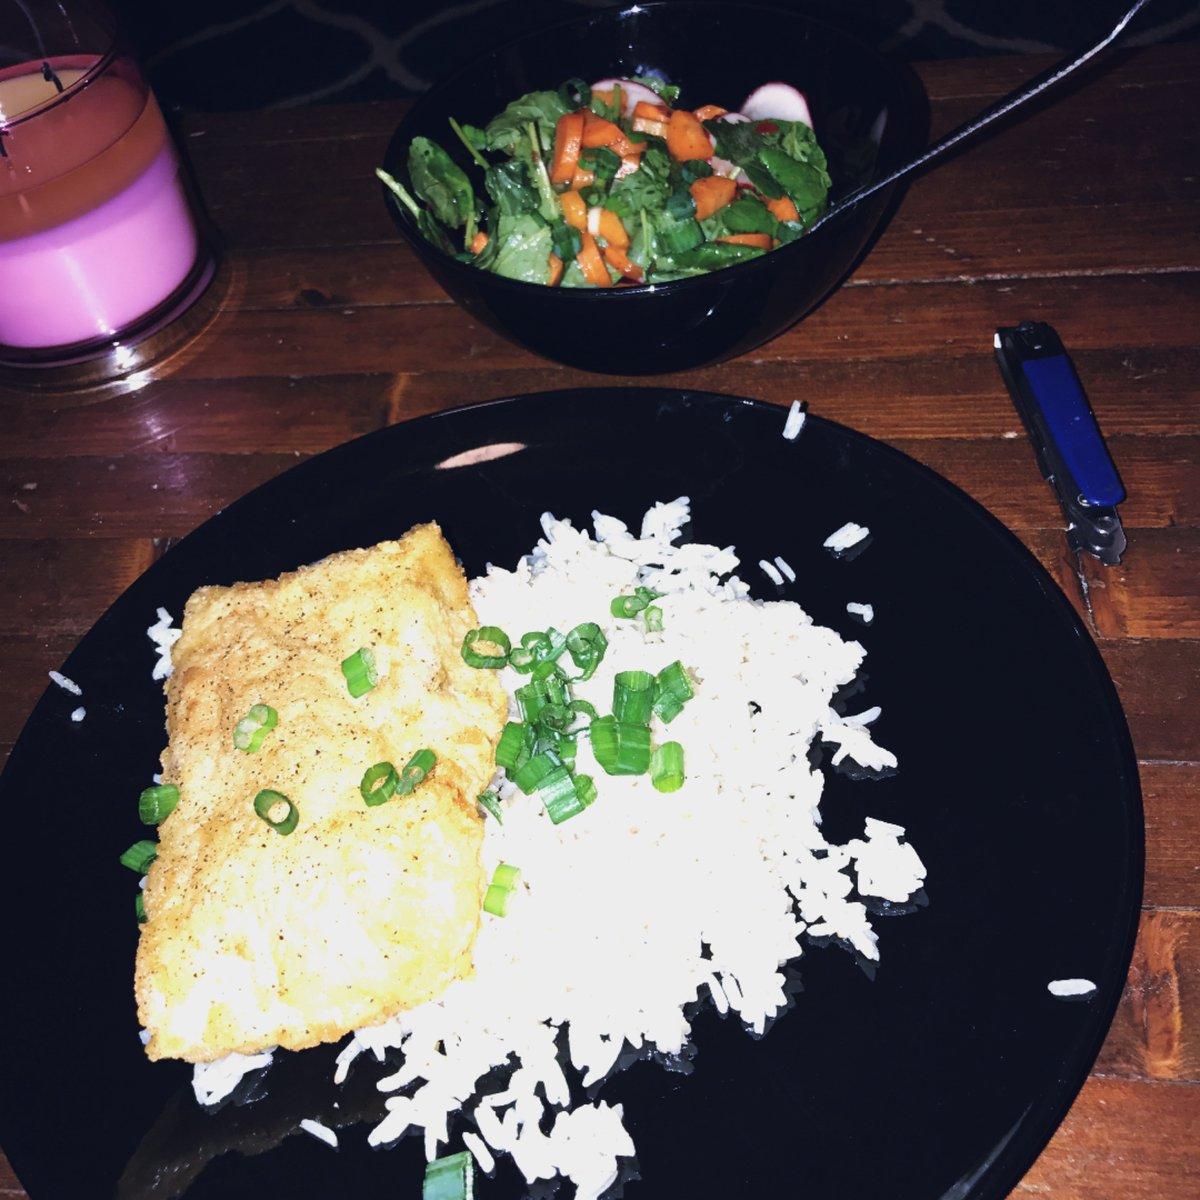 Blue apron tempura cod - Tempura Fried Cod With Thai Style Vegetable Salad Jasmine Rice Blueapron